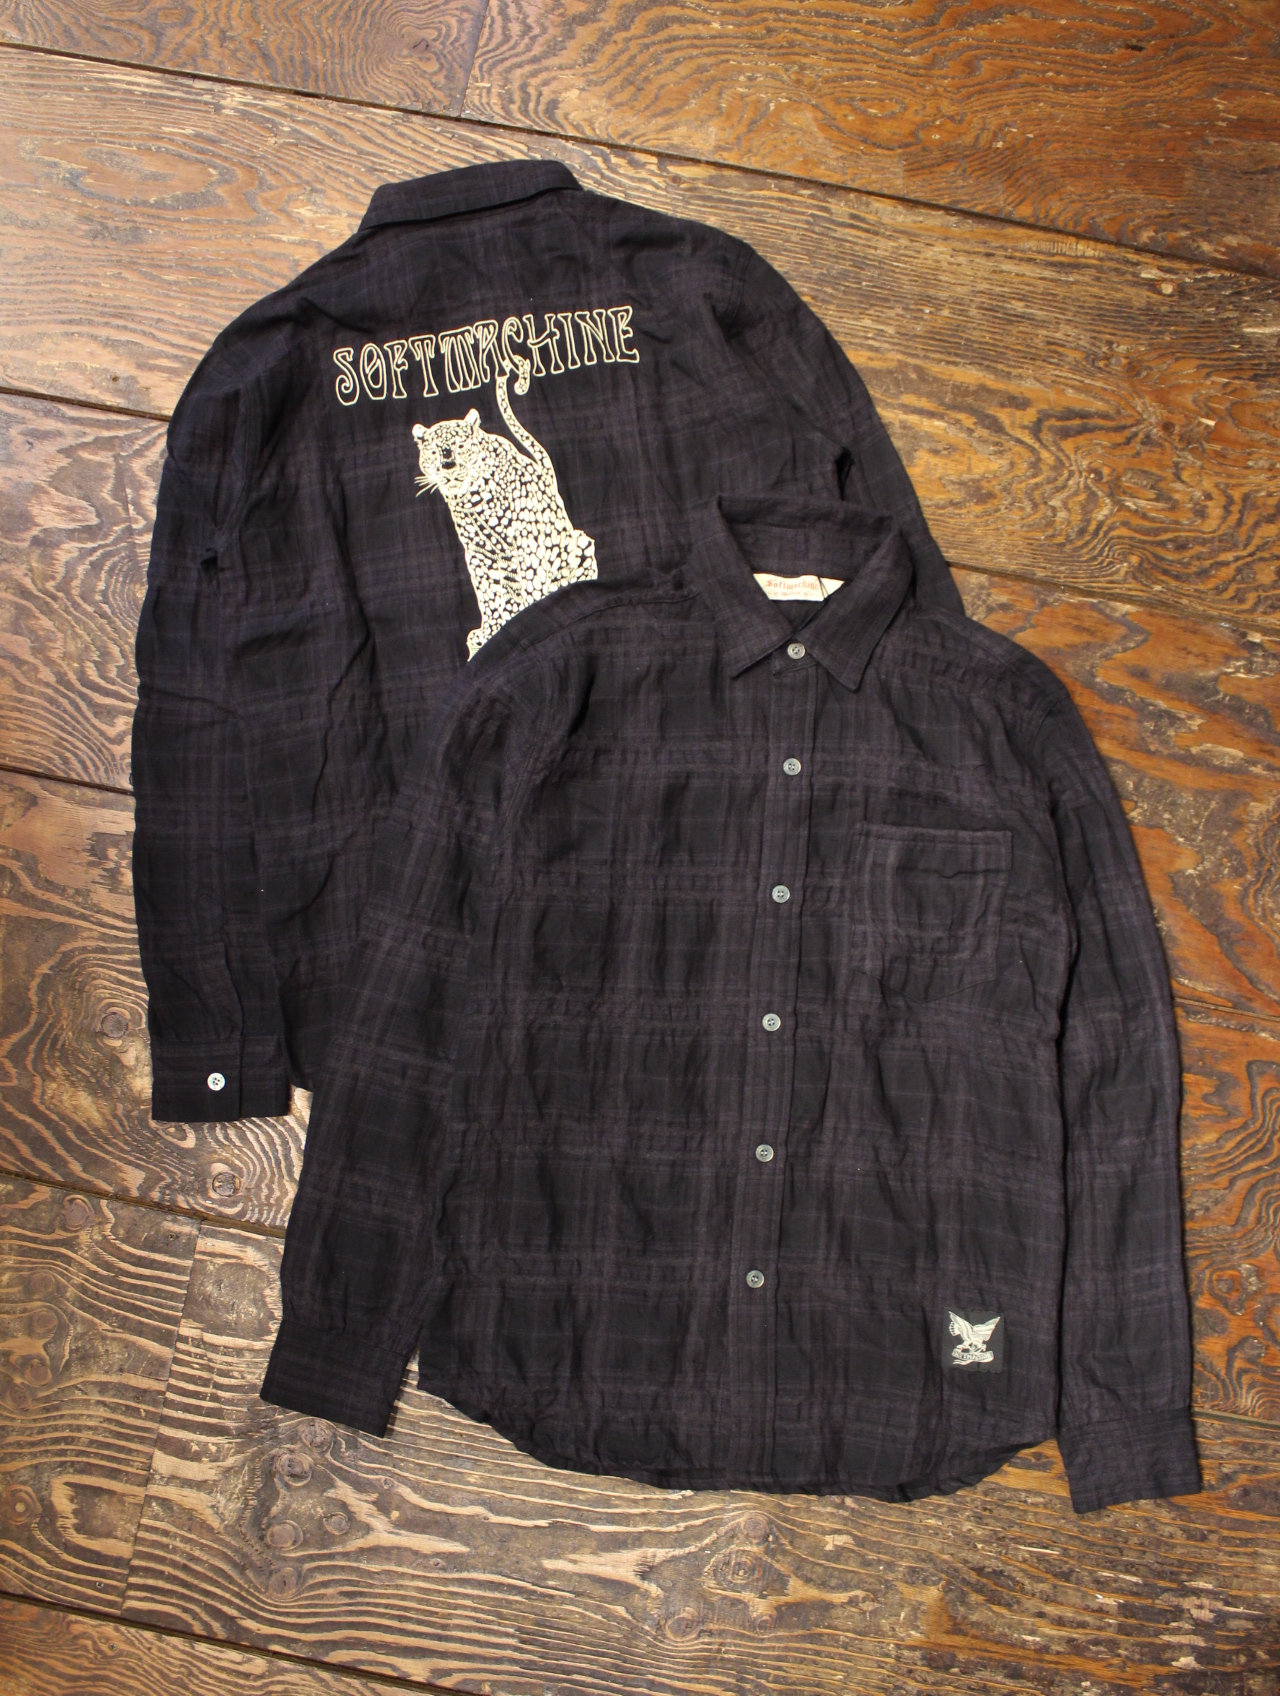 SOFTMACHINE  「KNOWLEDGE SHIRTS L/S」 チェックシャツ